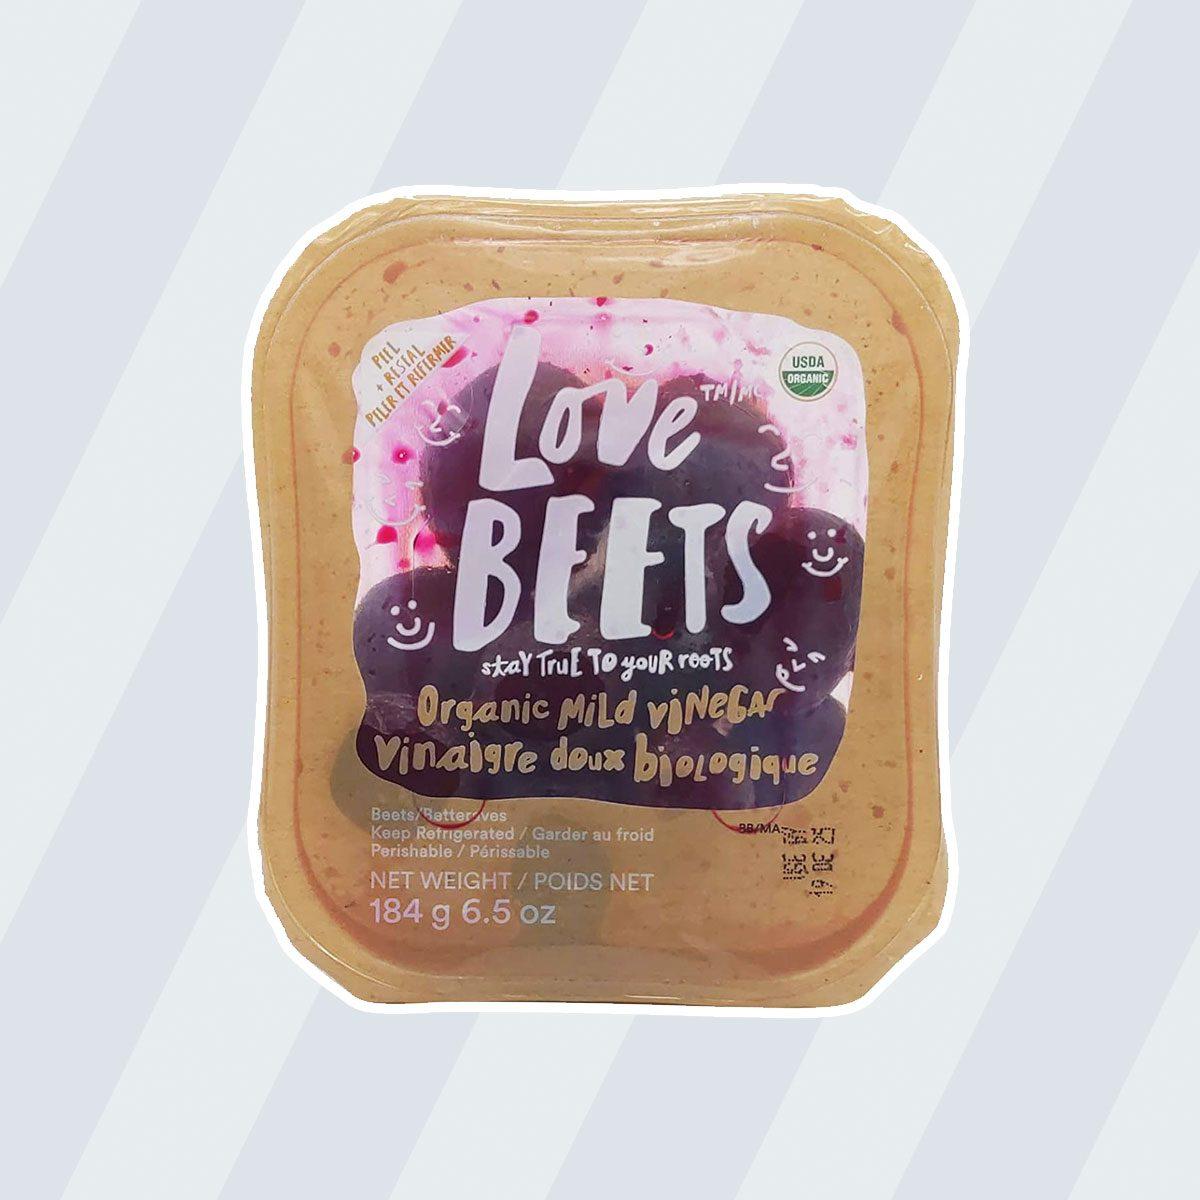 healthy snacks to buy Love Beets Organic Mild Vinegar Beets, 6.5 oz